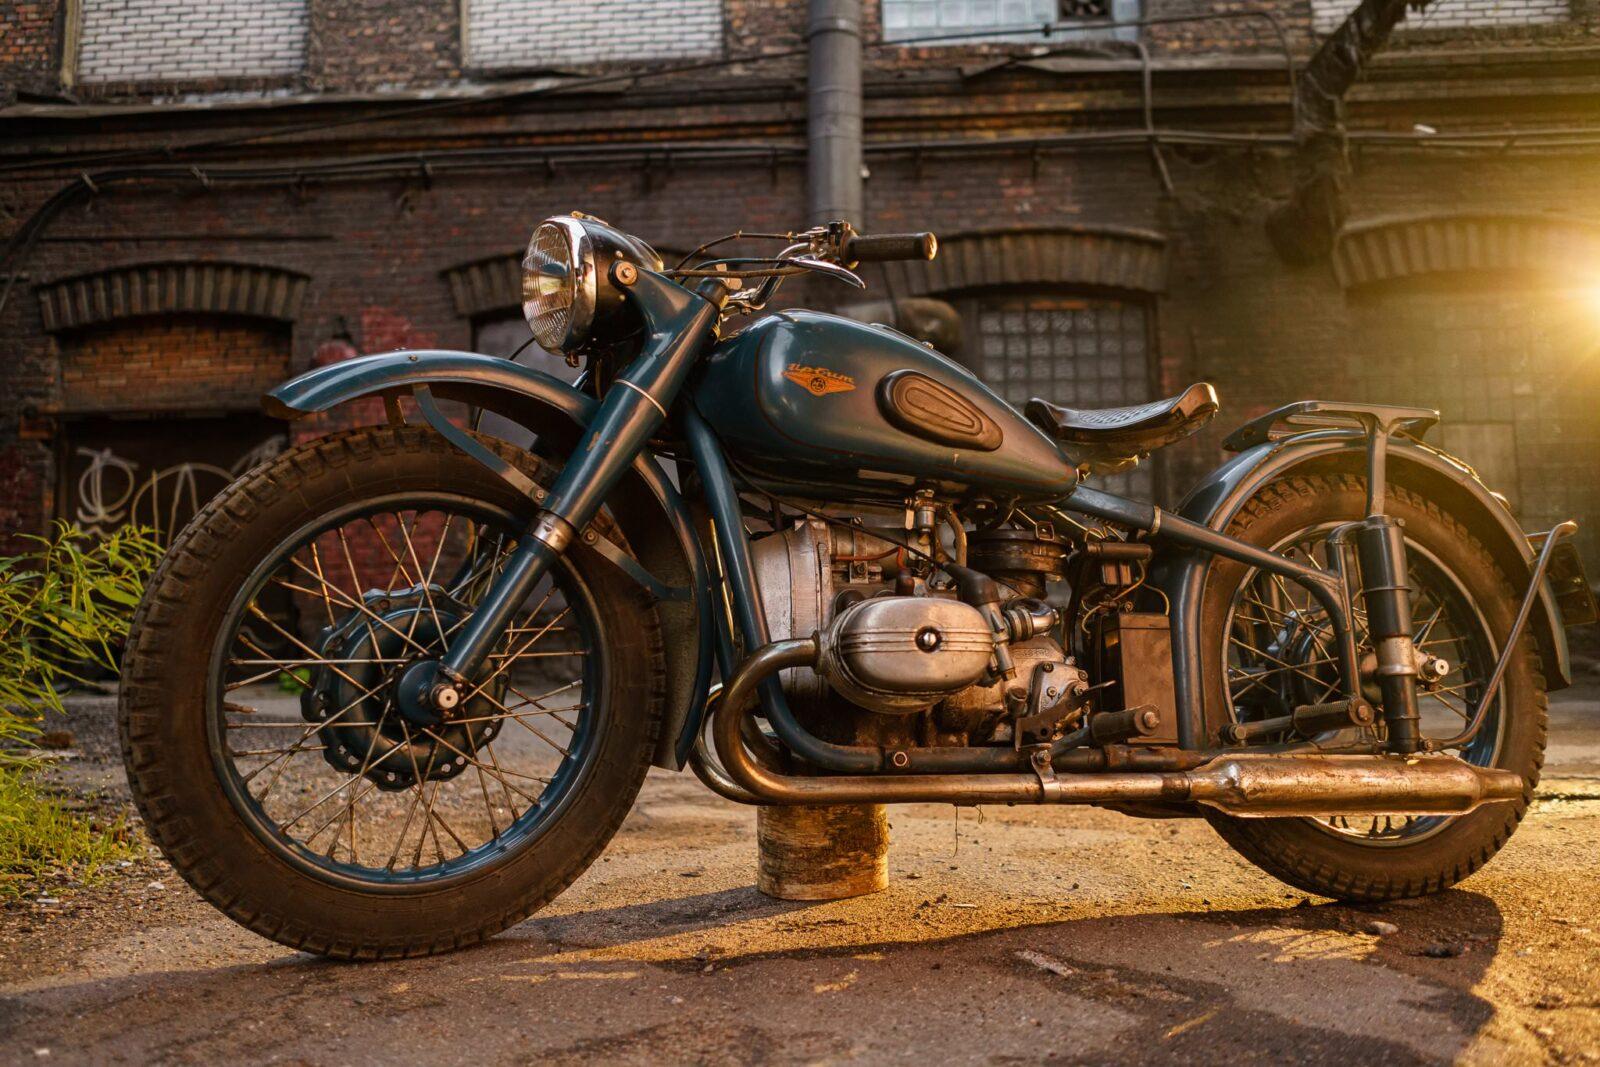 IMZ M-61 Soviet Motorcycle 7